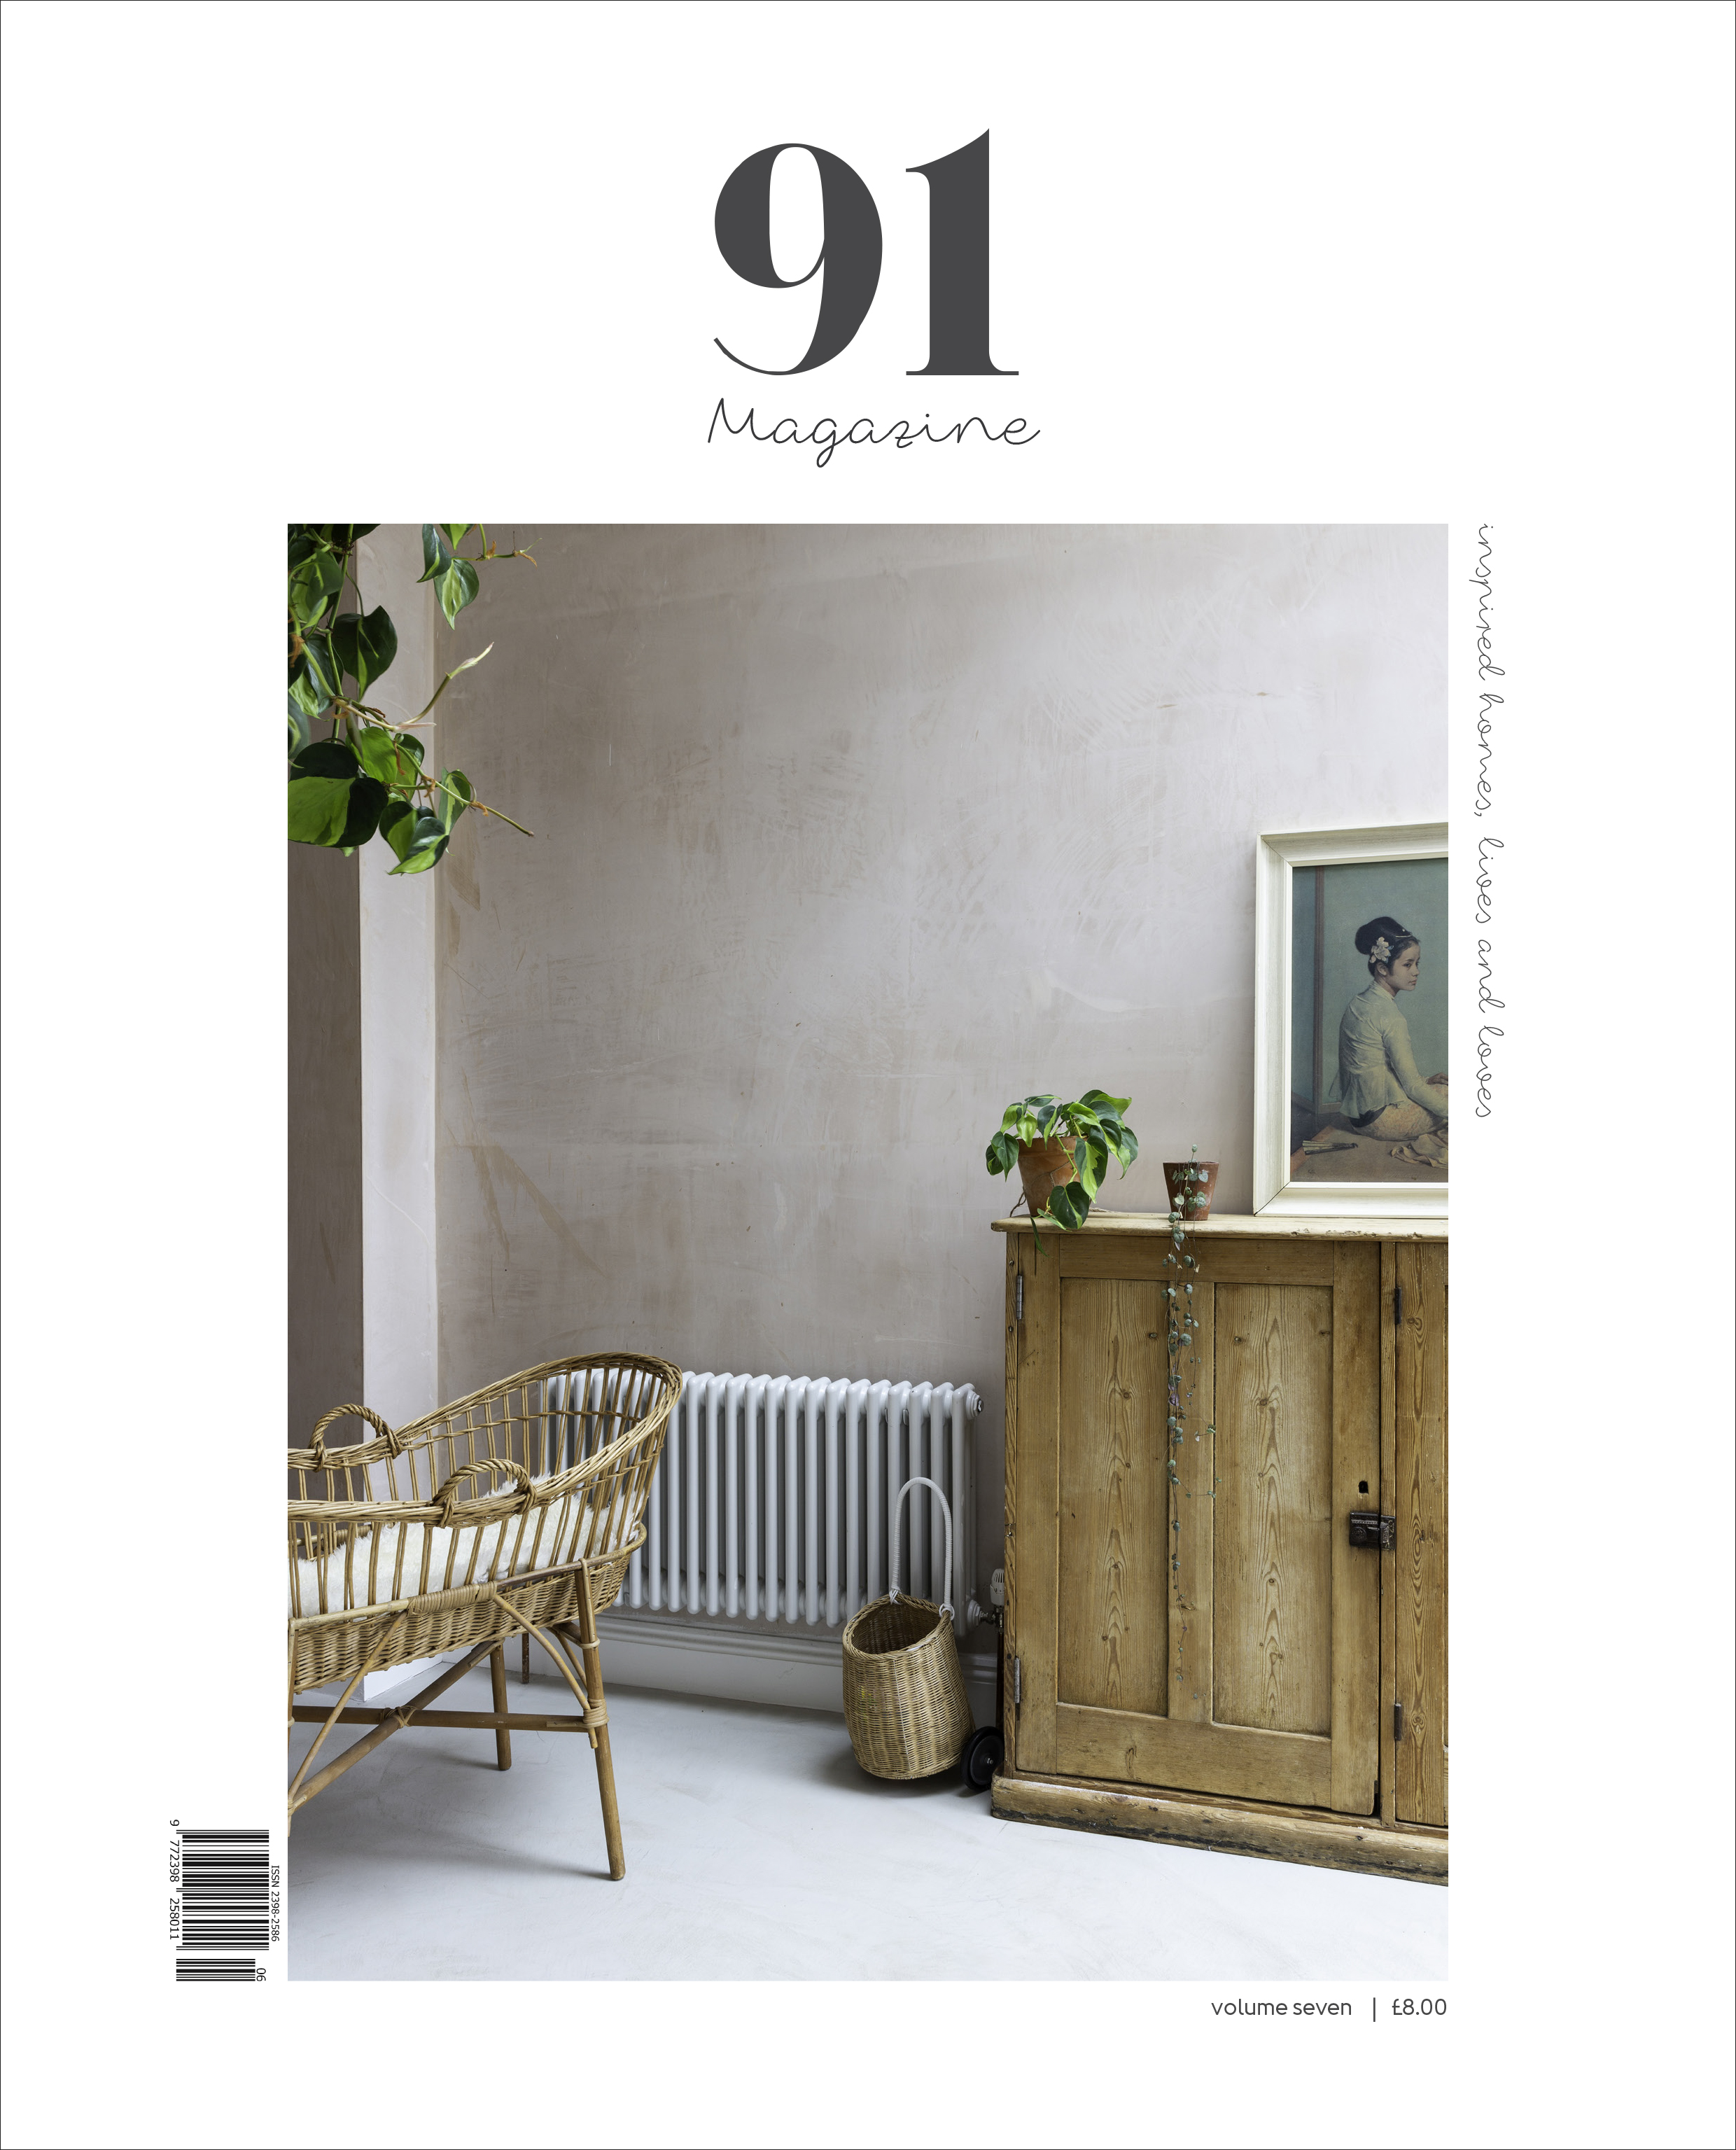 91 Magazine Volume 7 cover